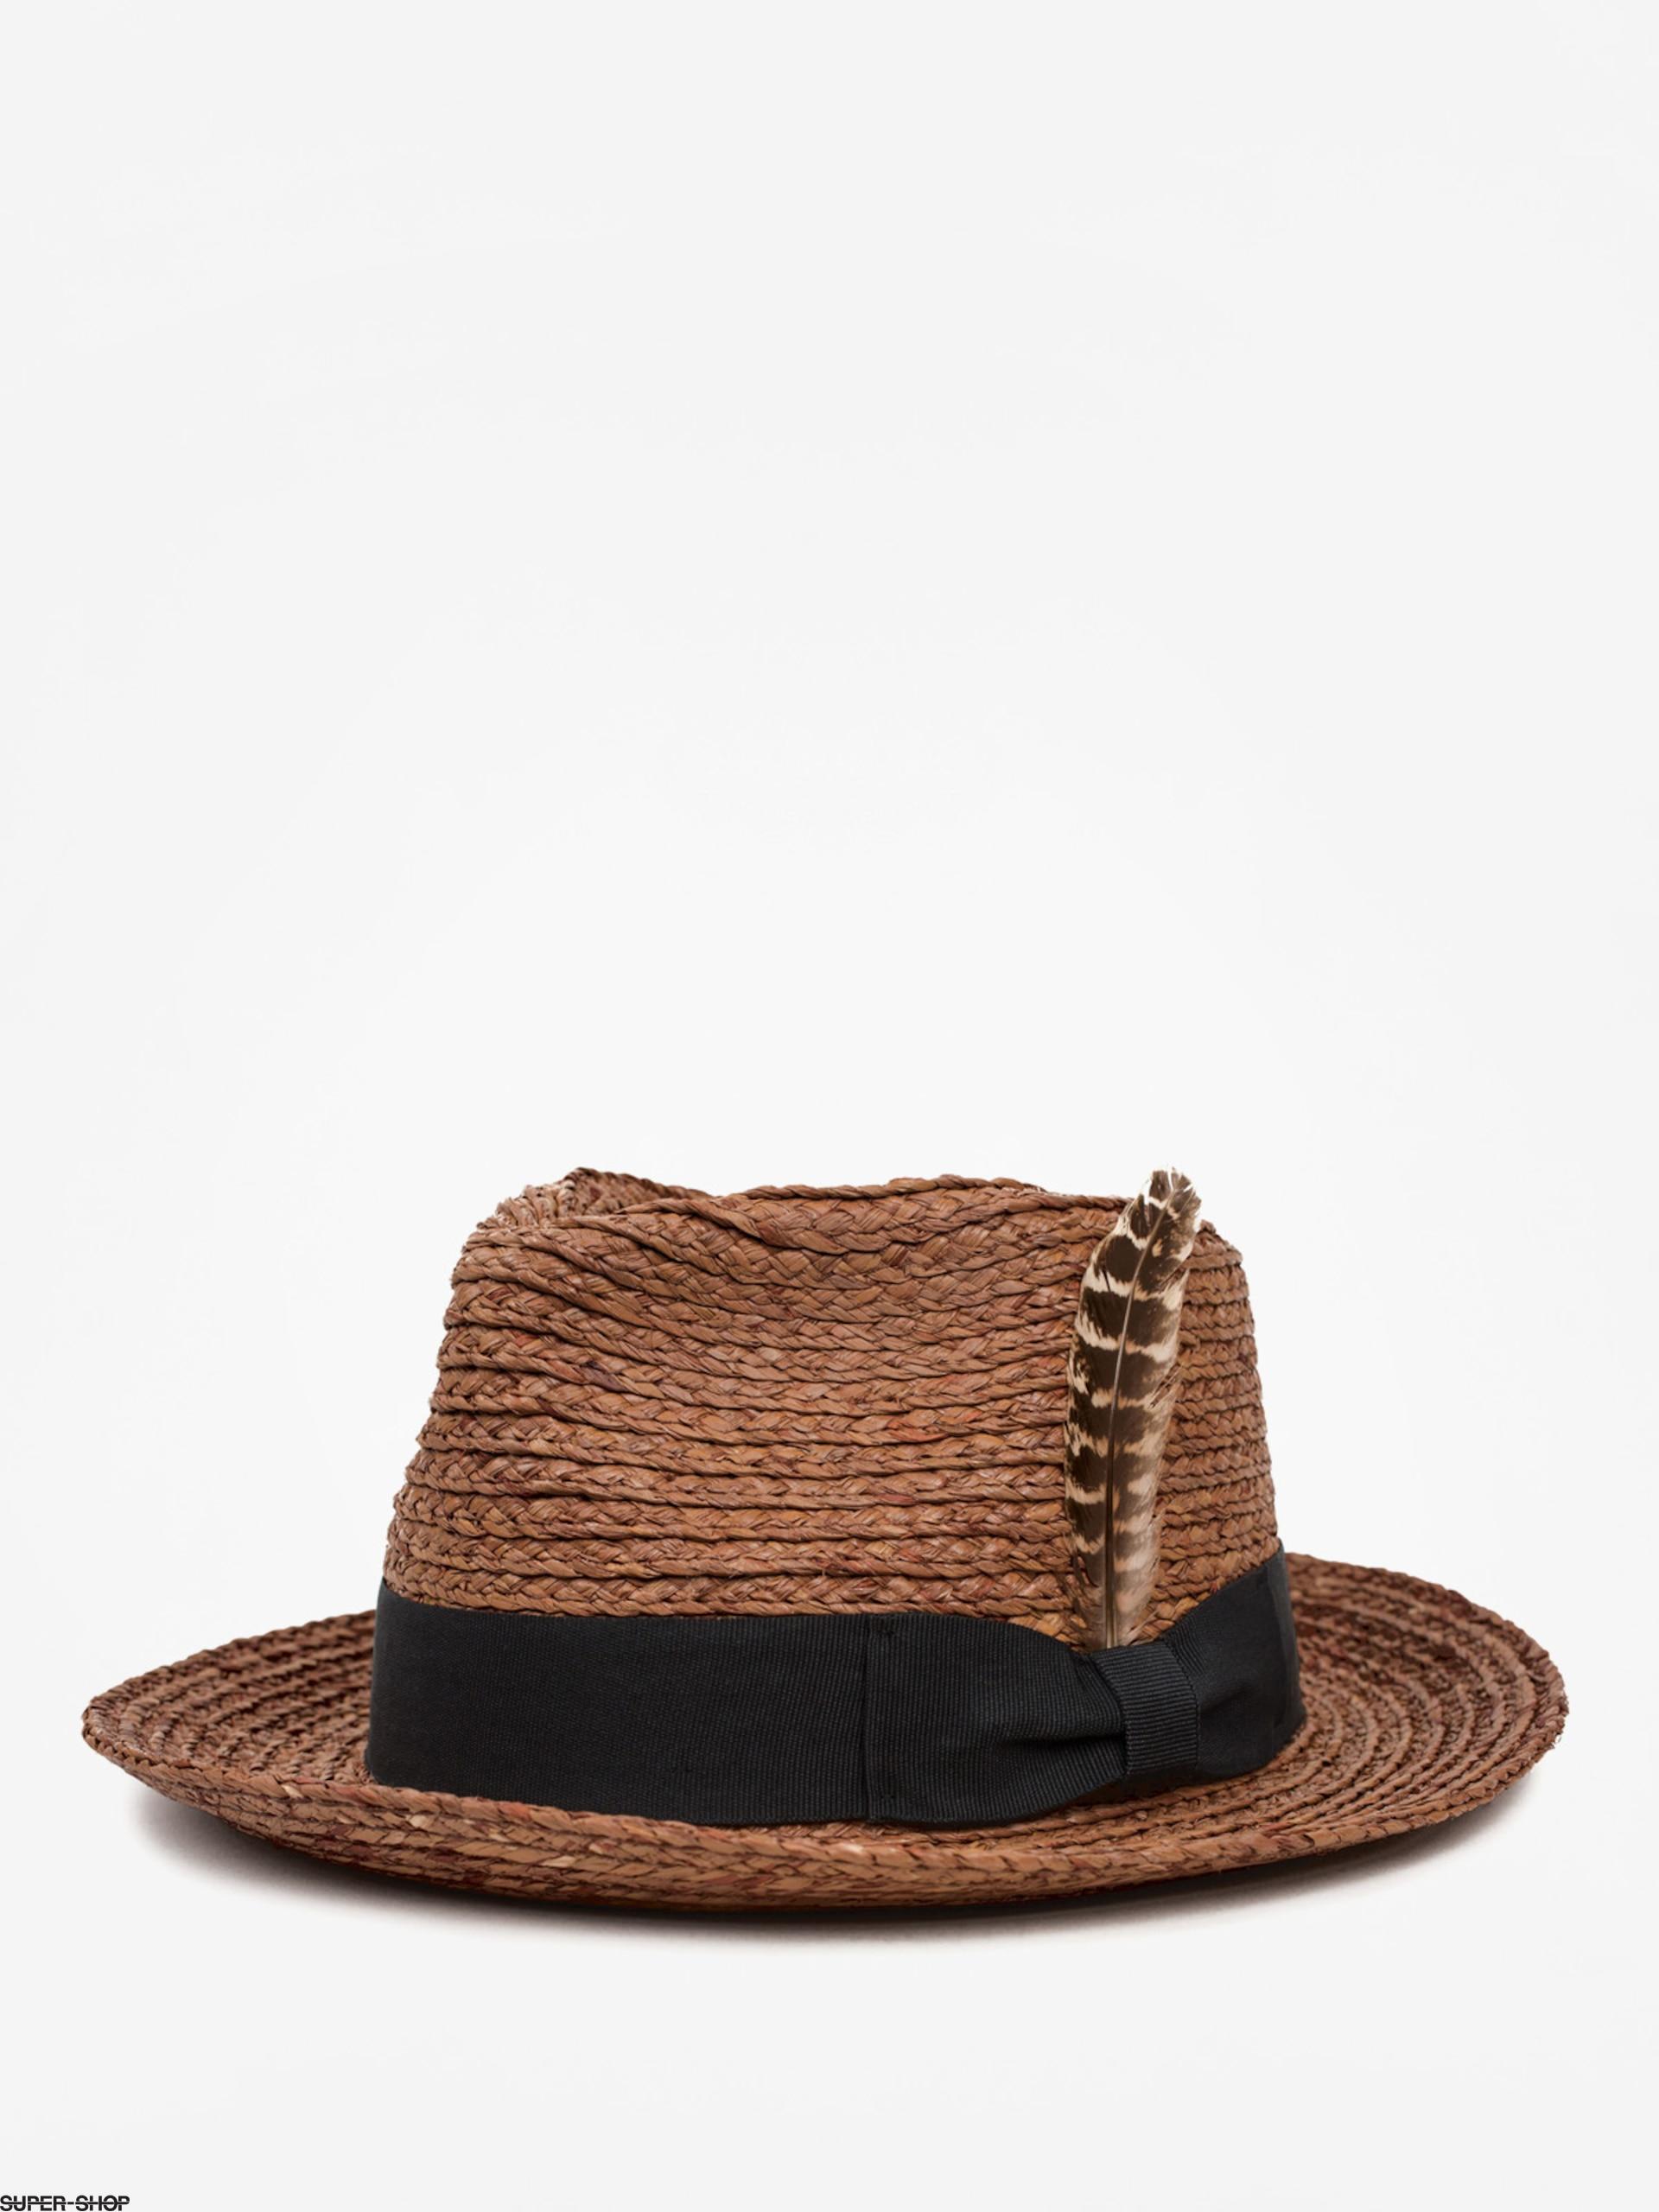 0b1015550a21d 937132-w1920-brixton-hat-crosby-ii-fedora-brown.jpg